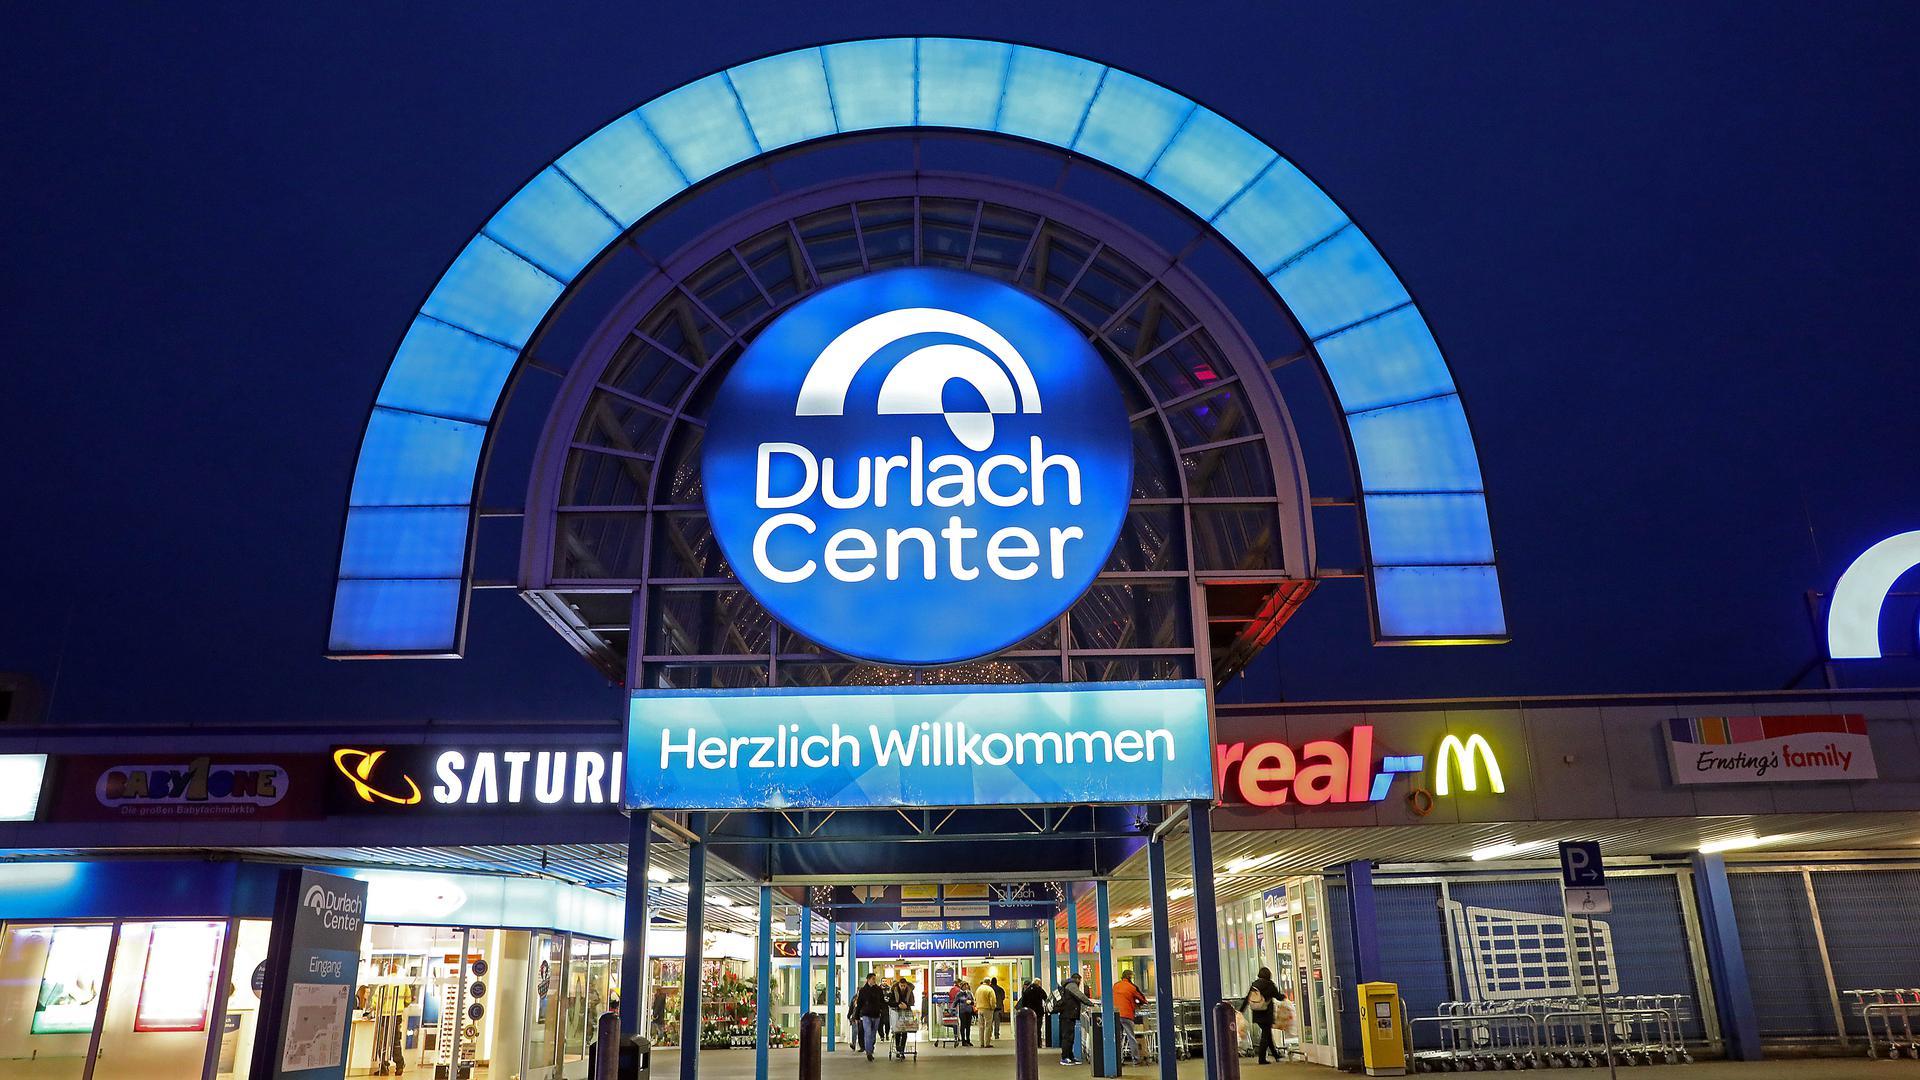 Real Center Durlach